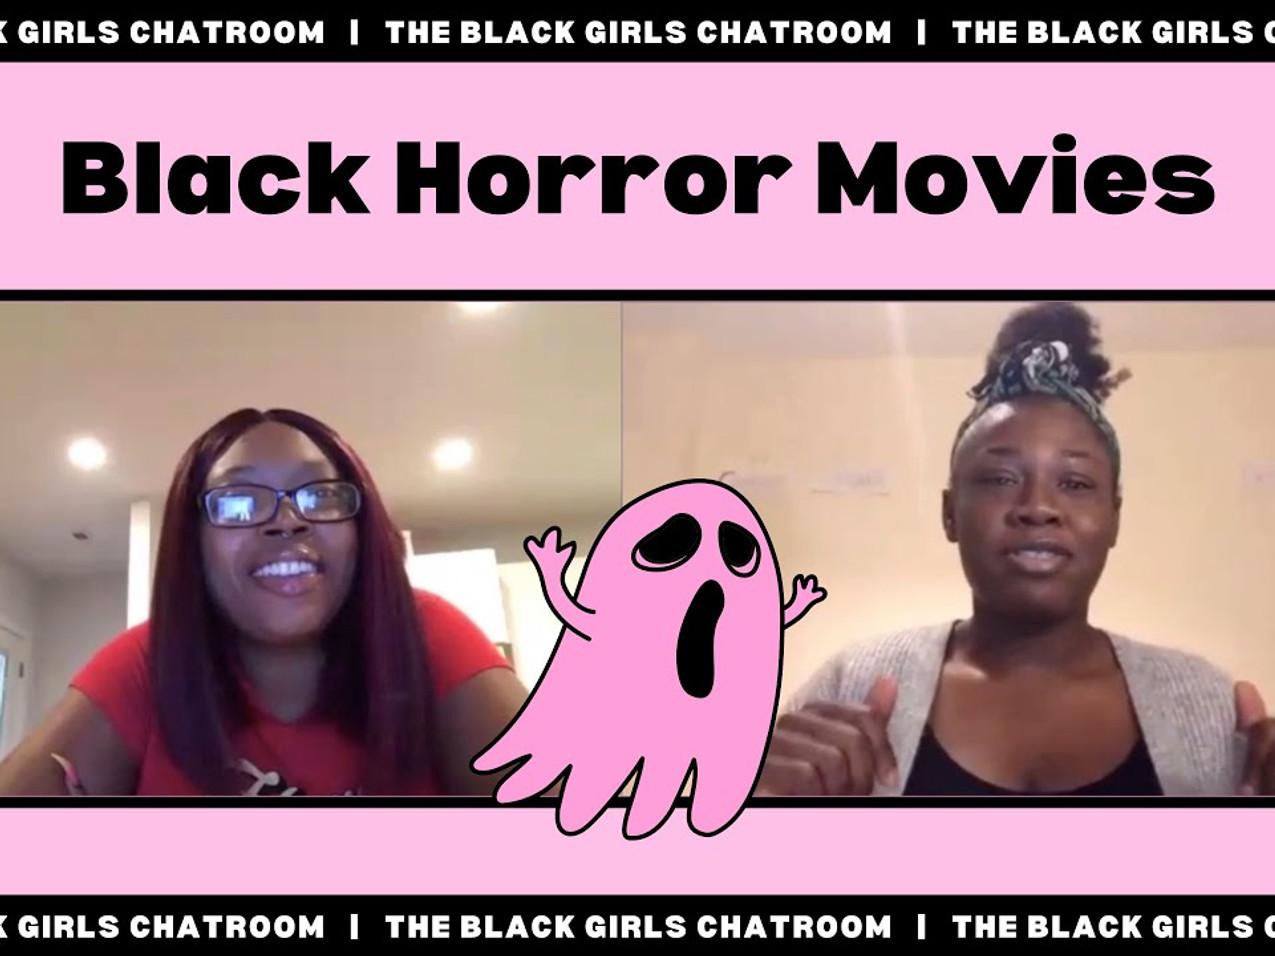 BiBi and Eunice discuss Black Horror Movies | S1 E7